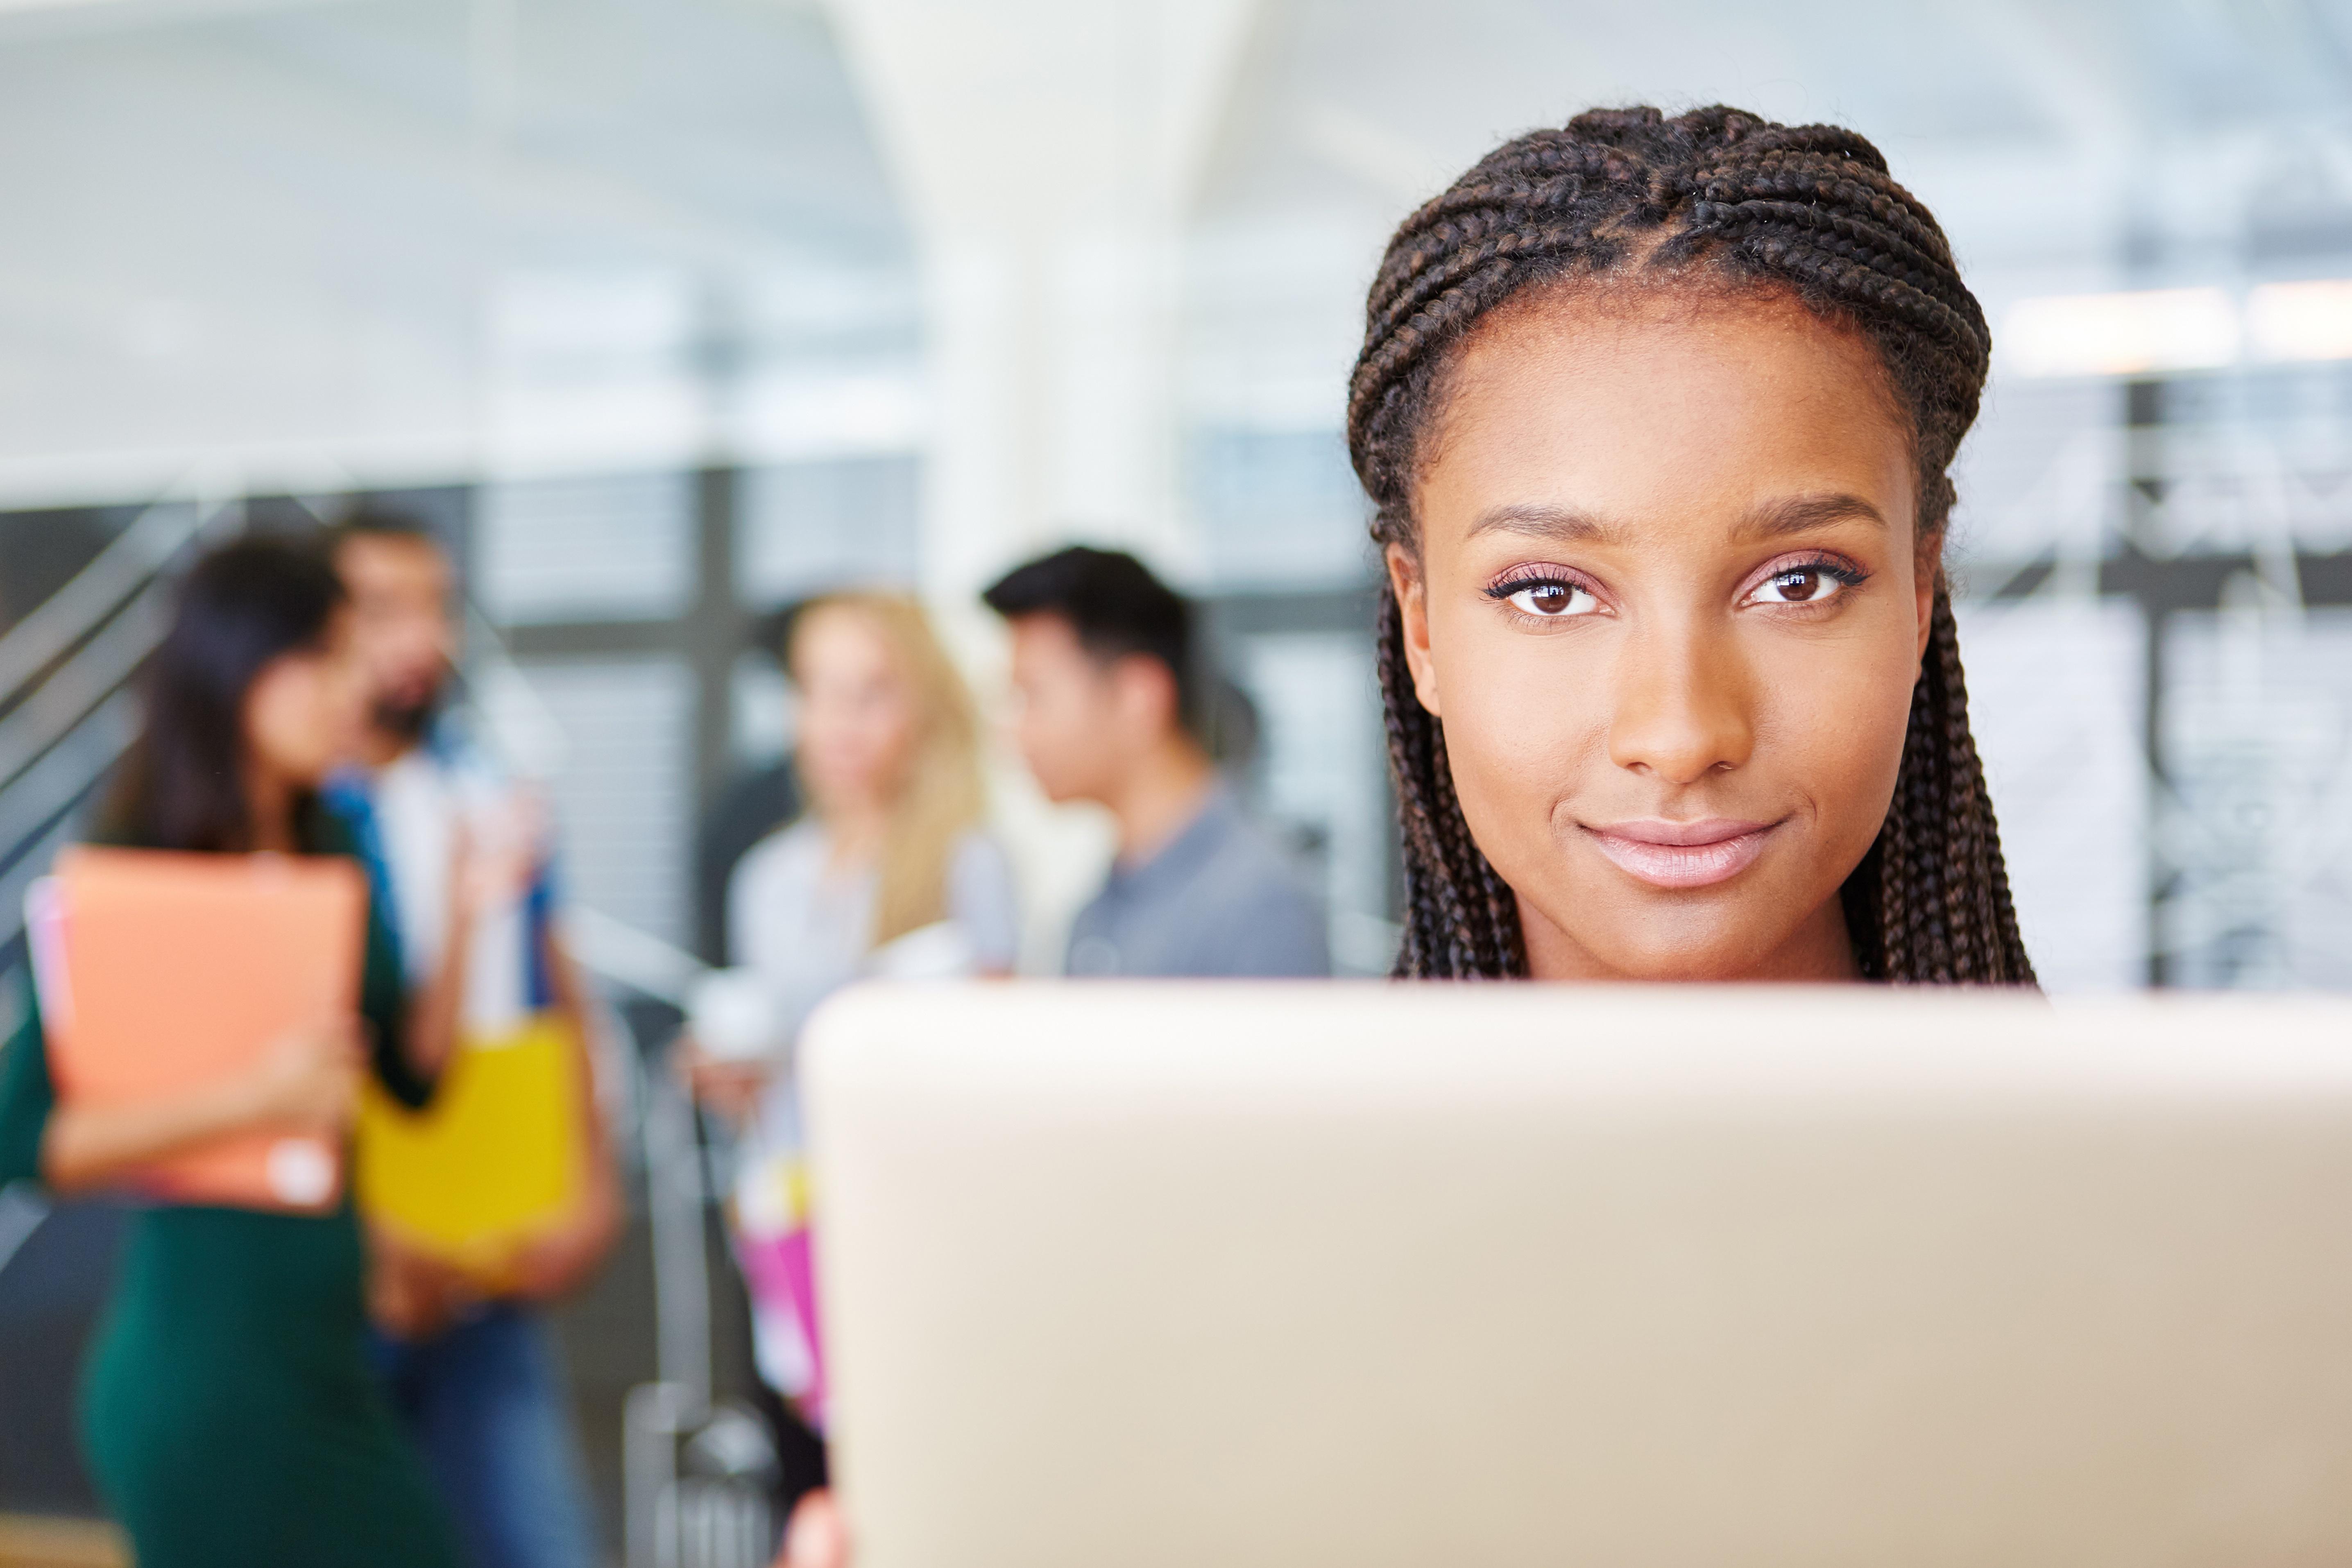 Making a company more diverse